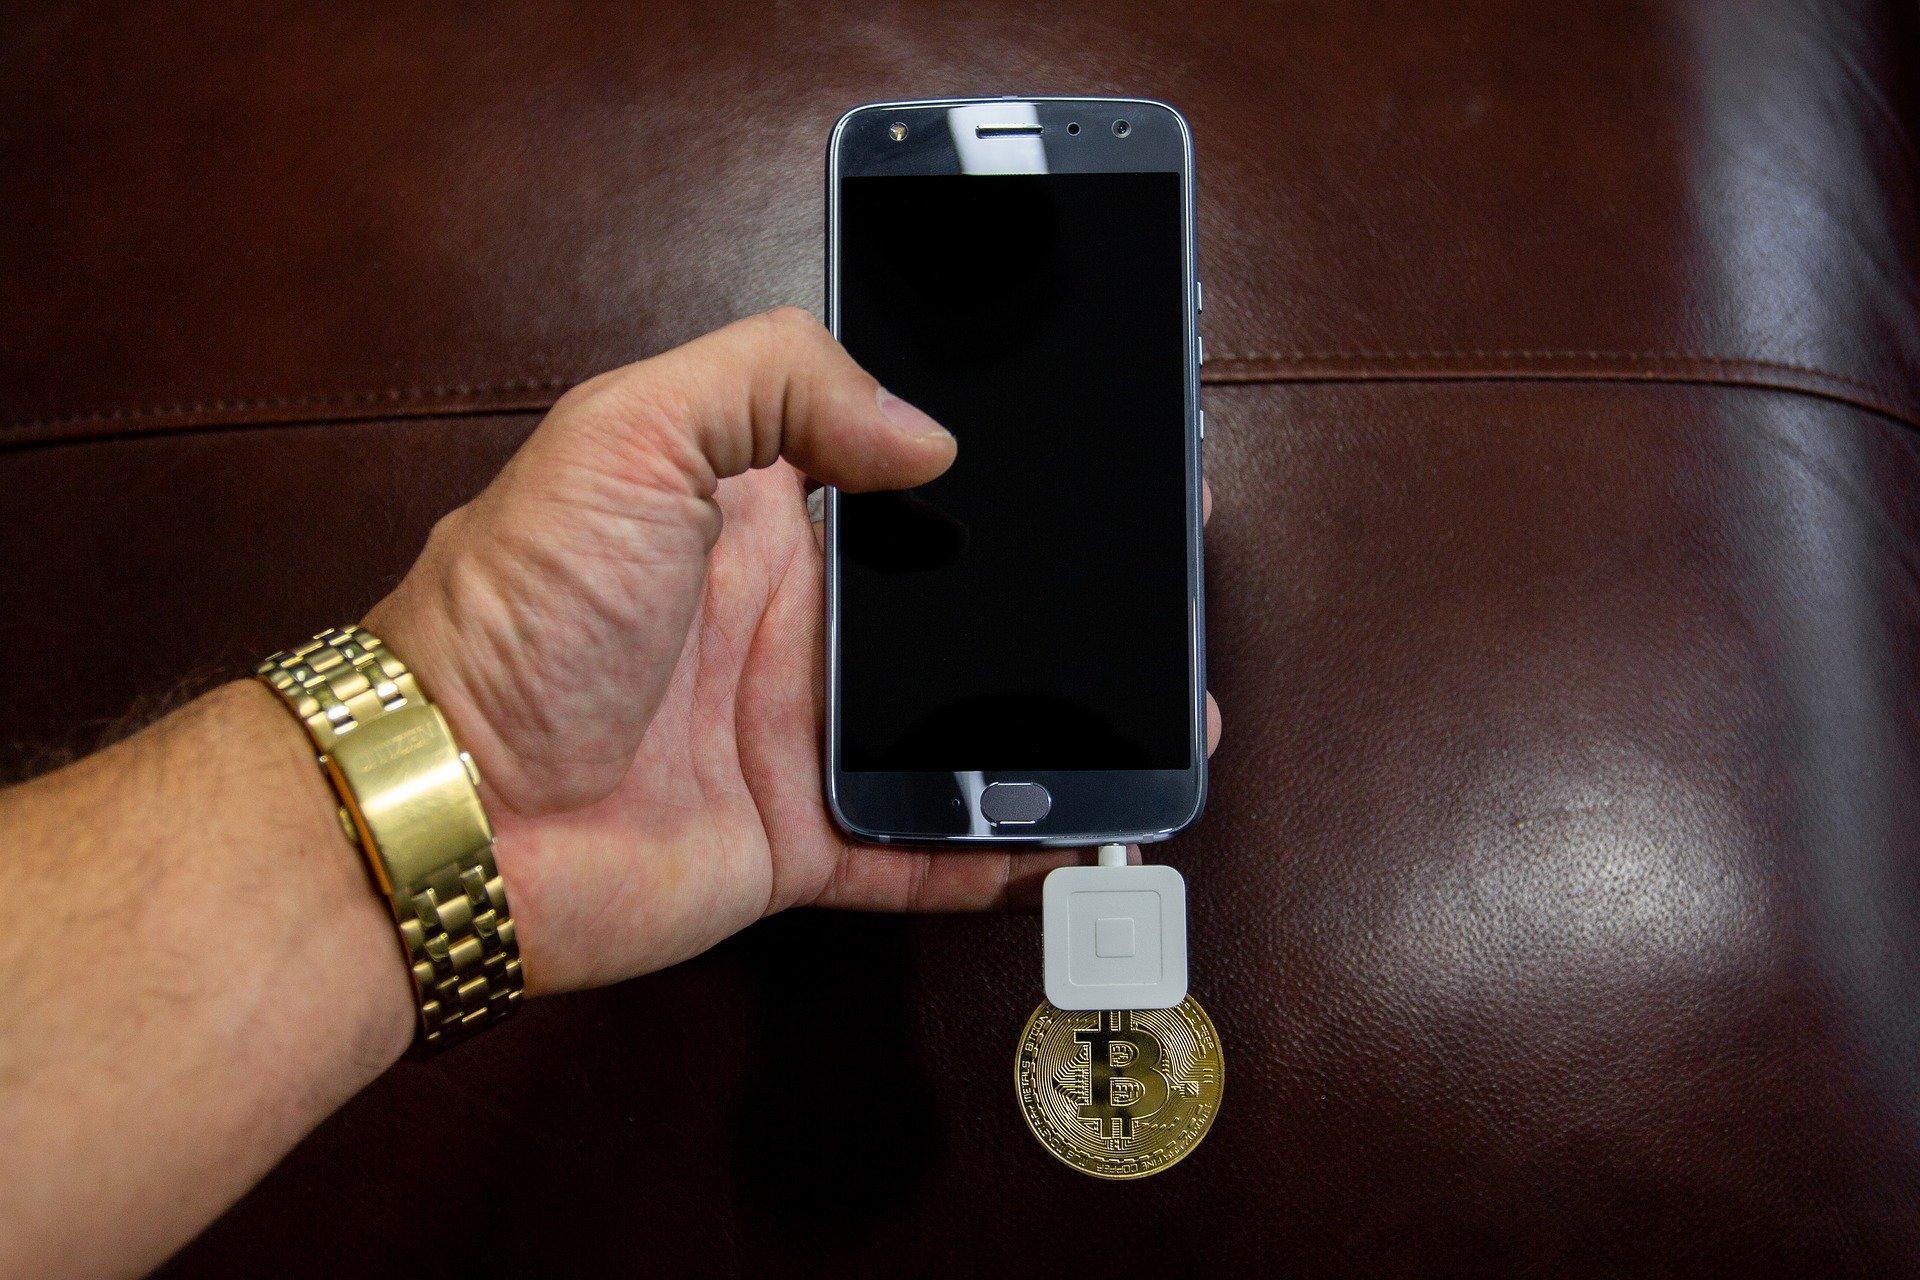 Poly Network Hacker has Revealed $140M Crypto Wallet Key